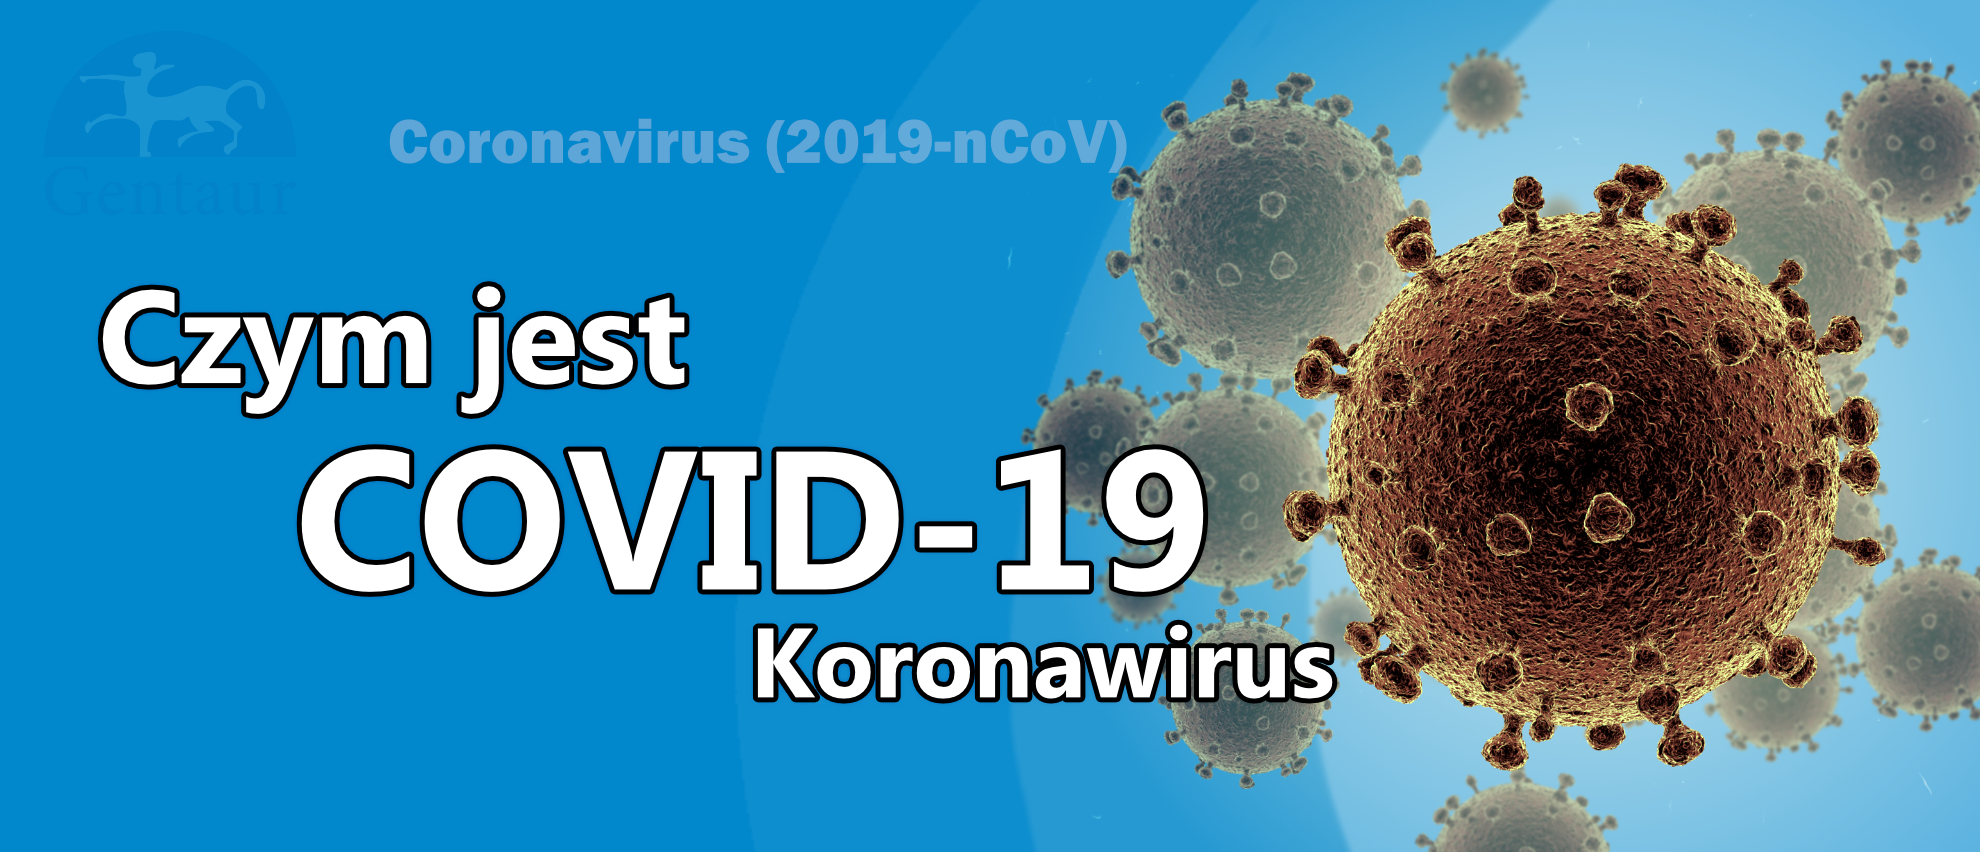 czym jest- koronawirus covid-19 corona virus